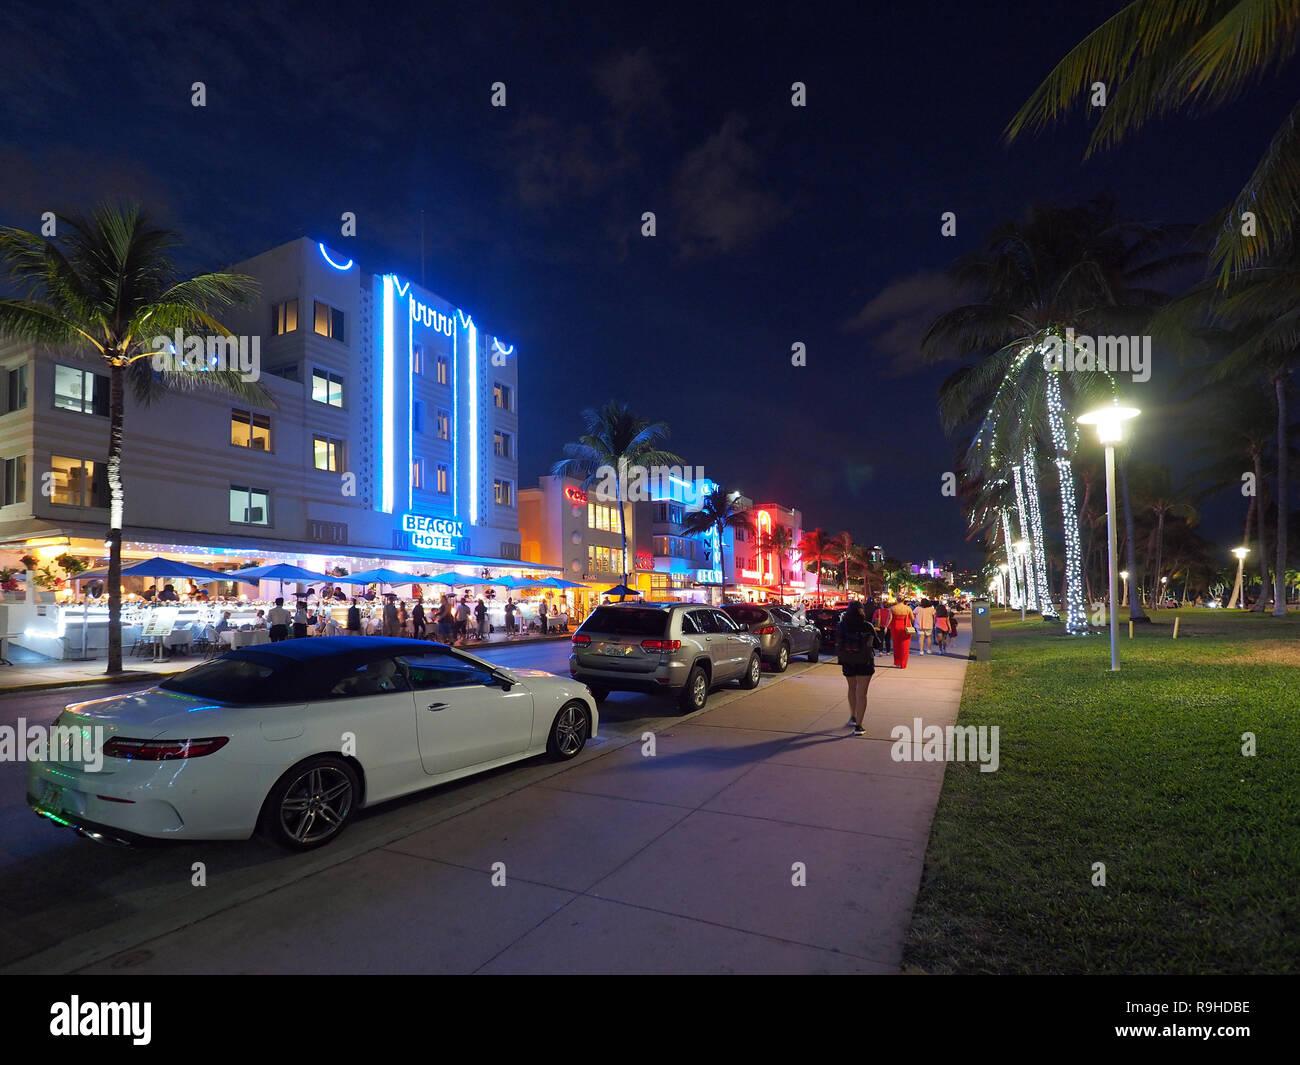 Miami Beach, Florida 12-19-2018 The Miami Beach Art Deco District and Ocean Drive at night. - Stock Image